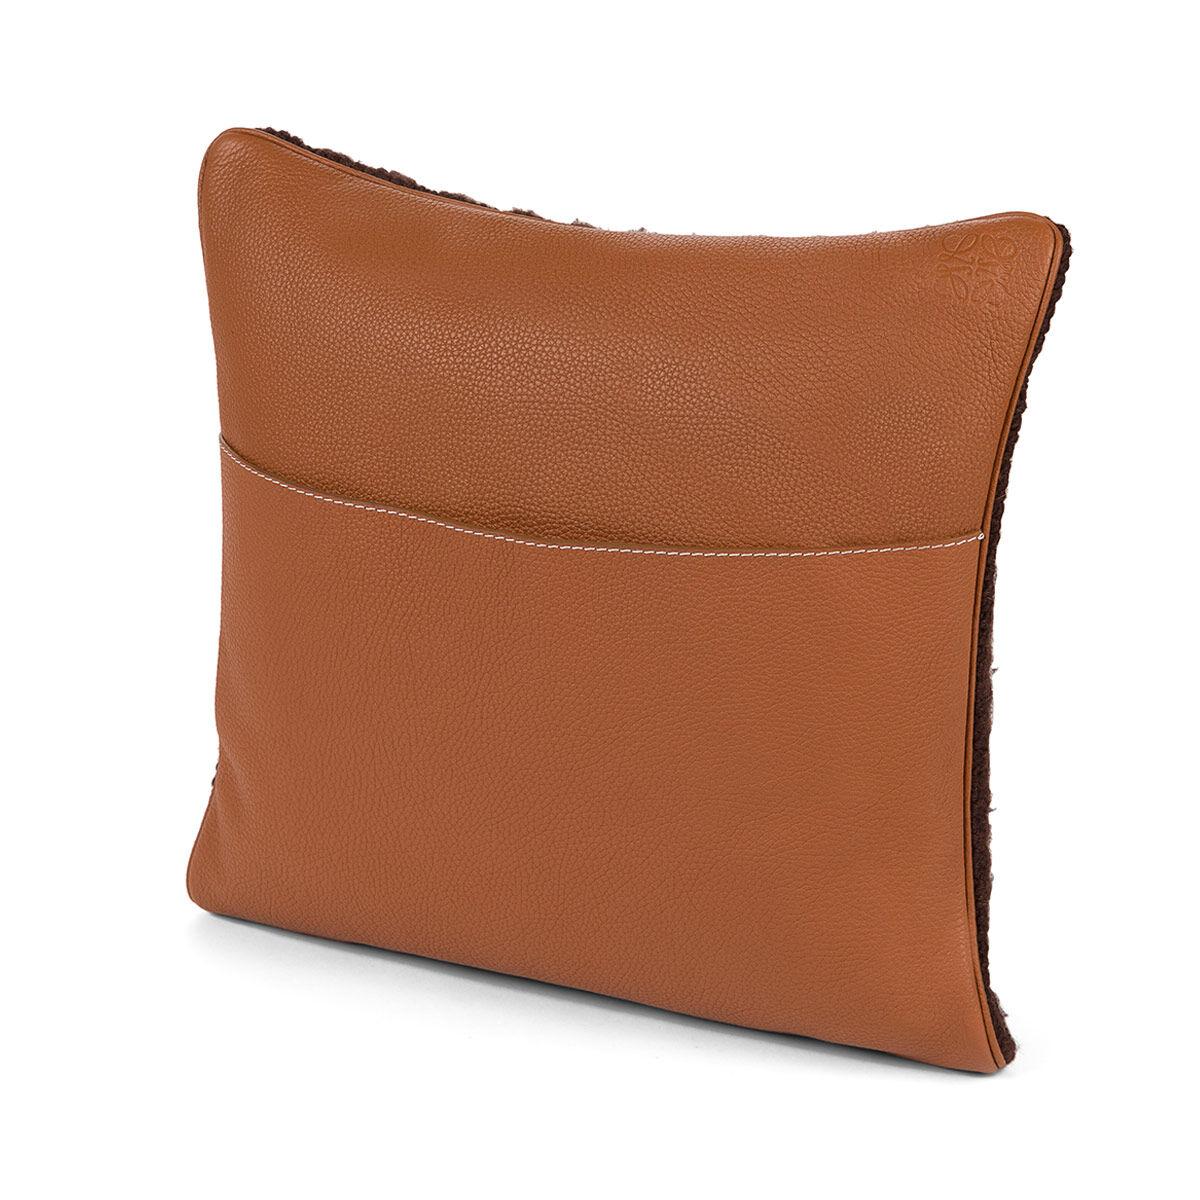 LOEWE Hand Knitted Cushion 1 40X40 Dark Brown/White all